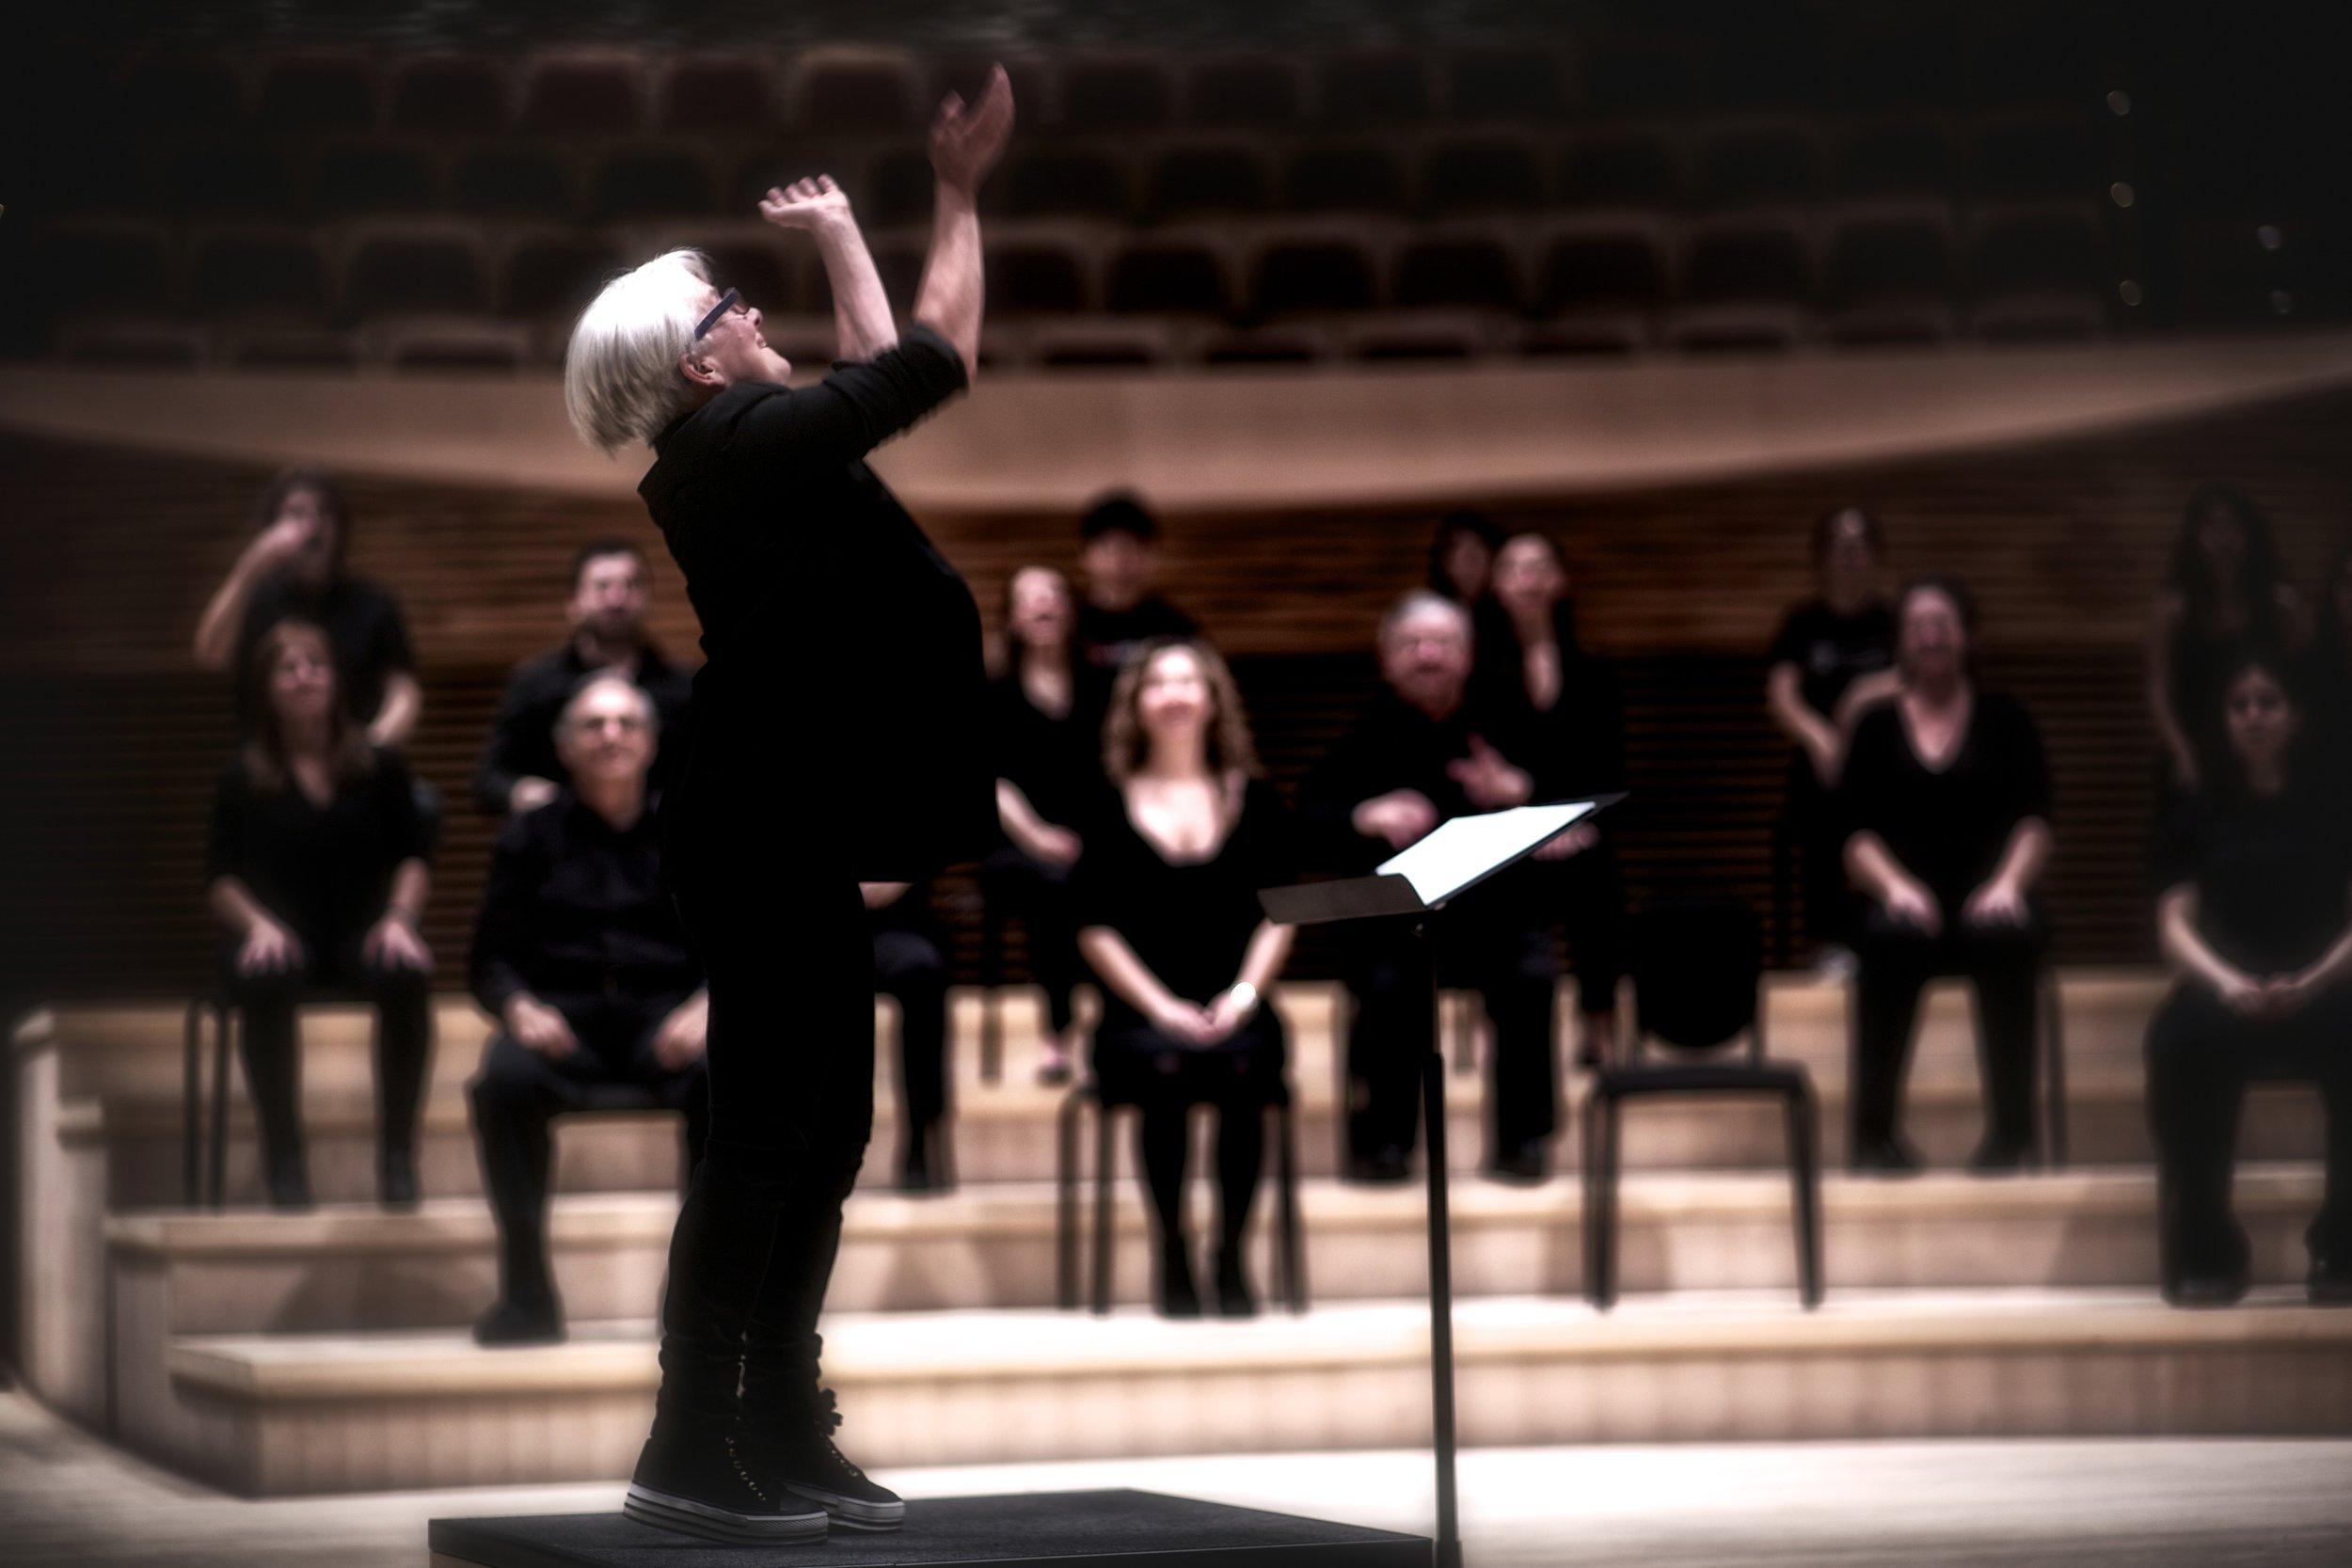 Ann _ conducting Symphonic Body _ Stanford - ad lib gesture.jpg